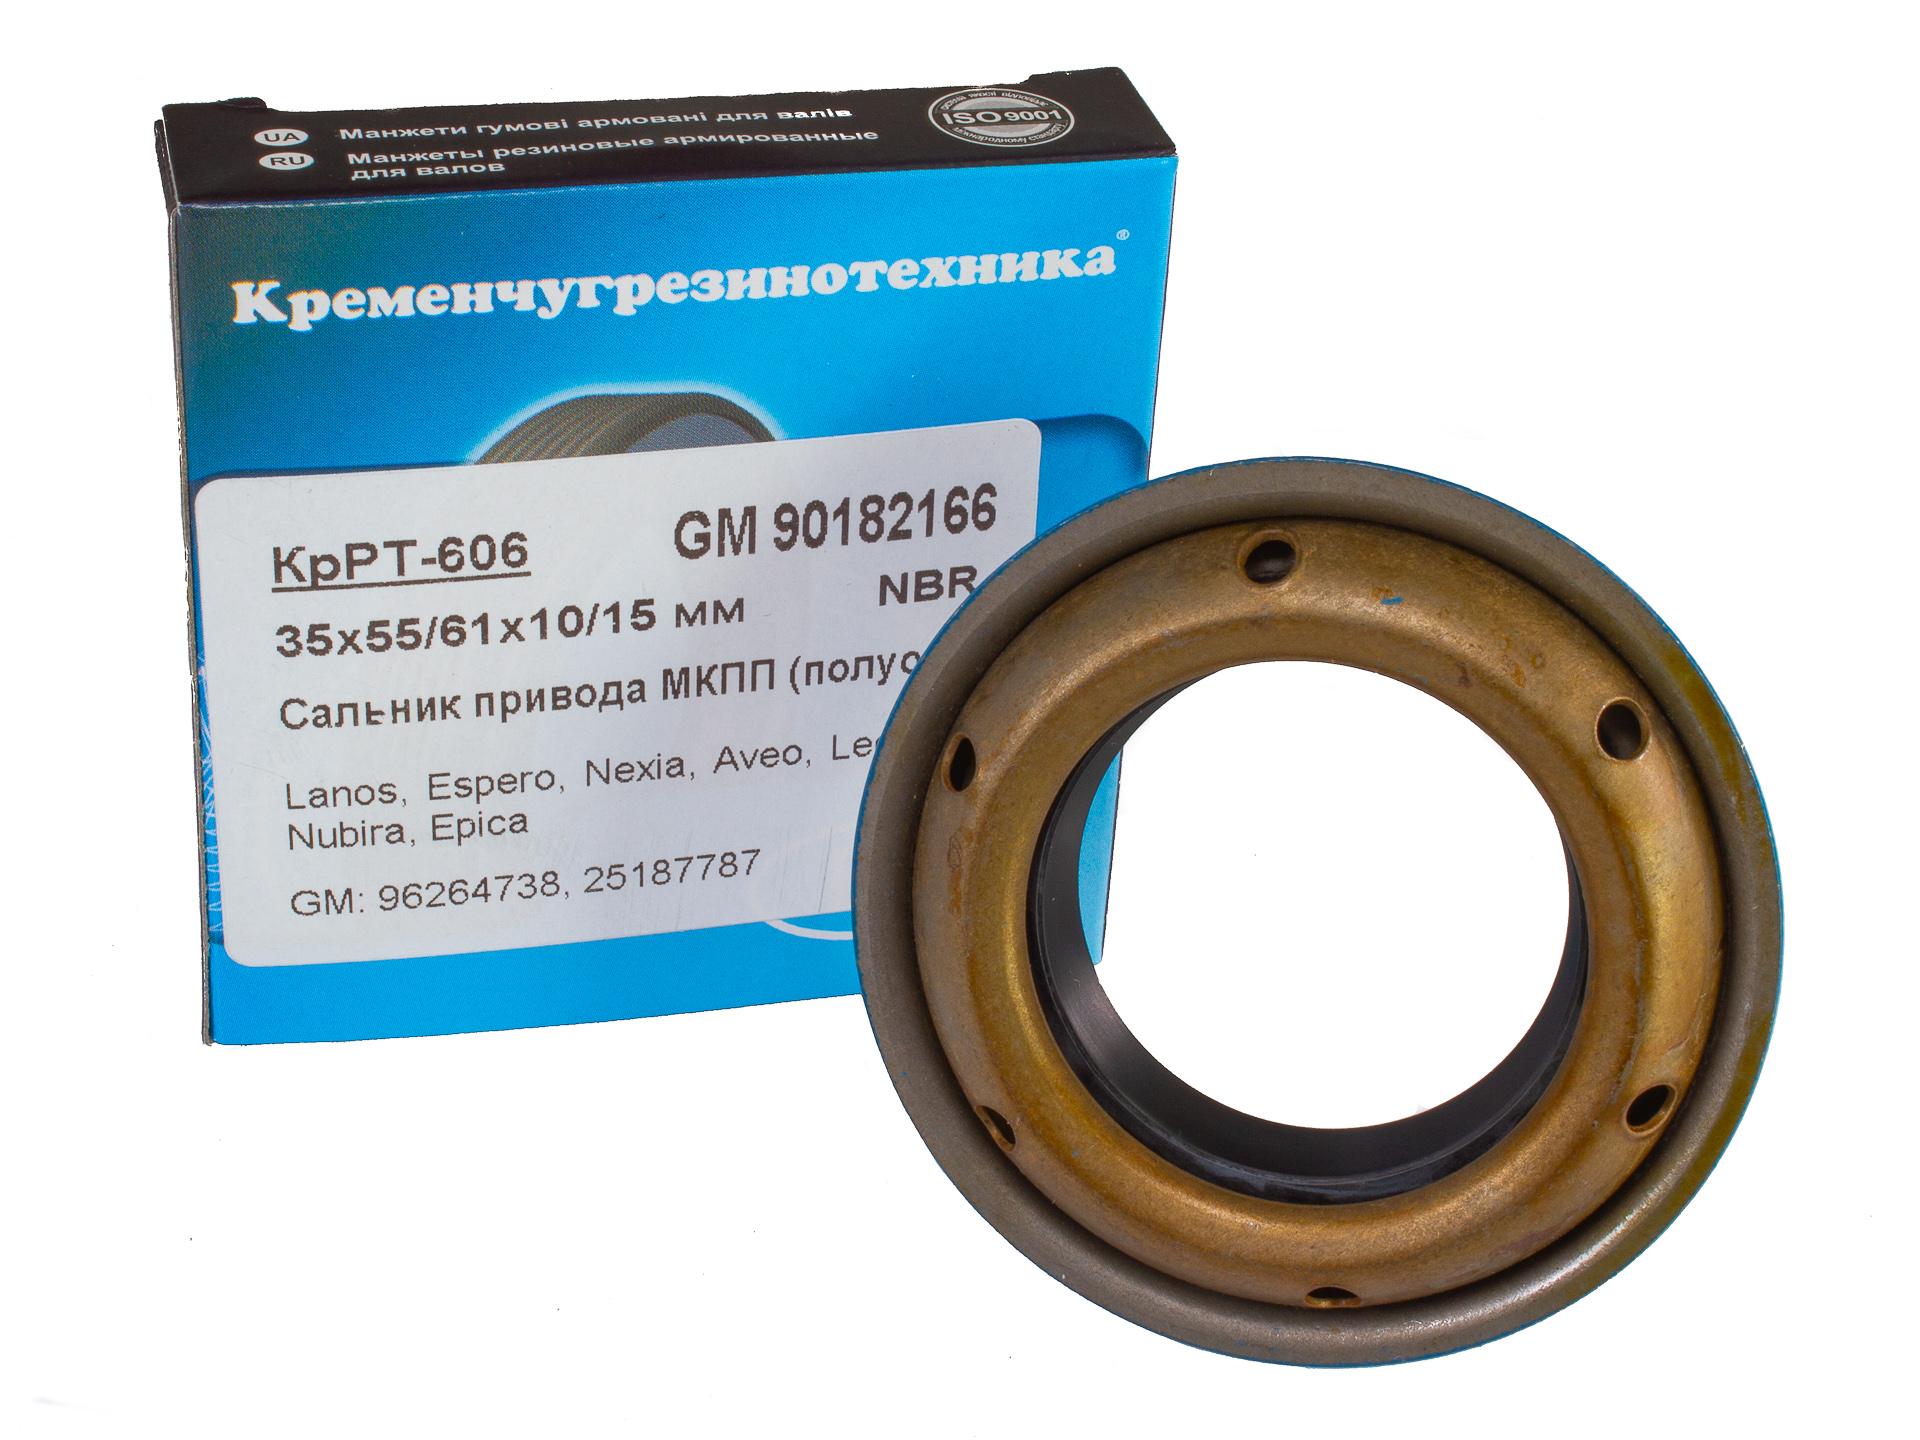 H16 1832 Wayne Individual Gasket and Oil Seal Replacement